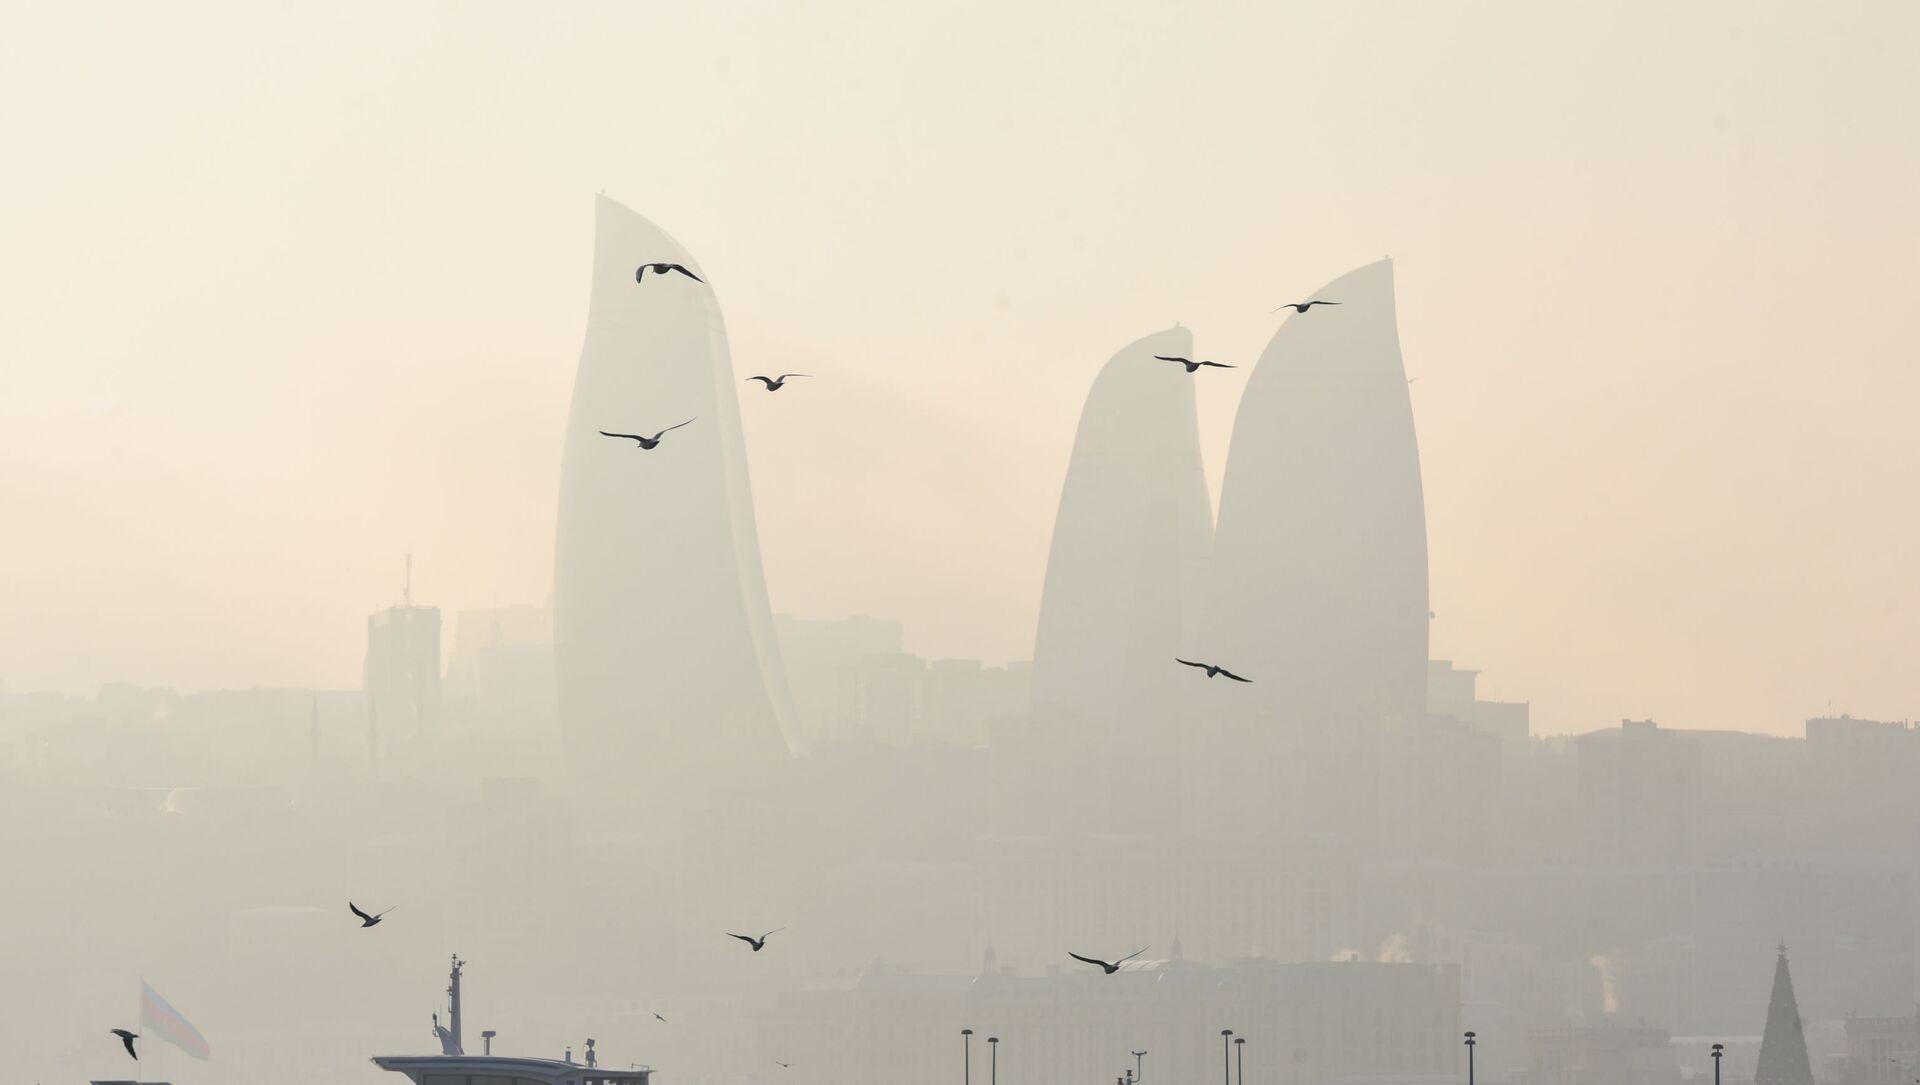 Вид на комплекс Flame Towers в Баку - Sputnik Азербайджан, 1920, 01.09.2021